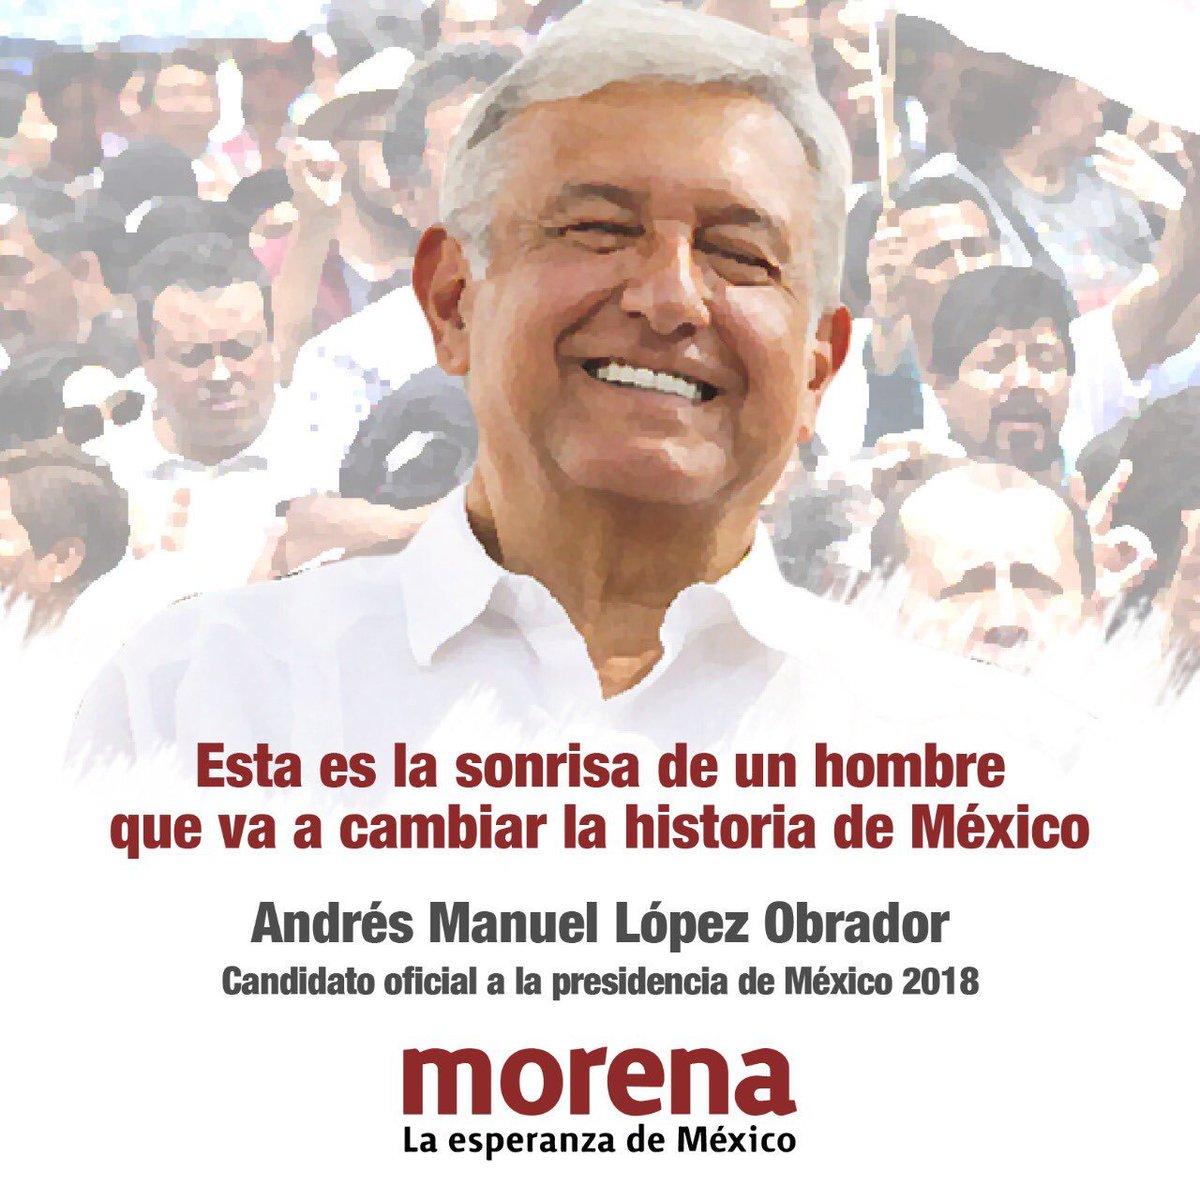 #PorqueSoyMexicano Latest News Trends Updates Images - DRFRANCISCORAMI